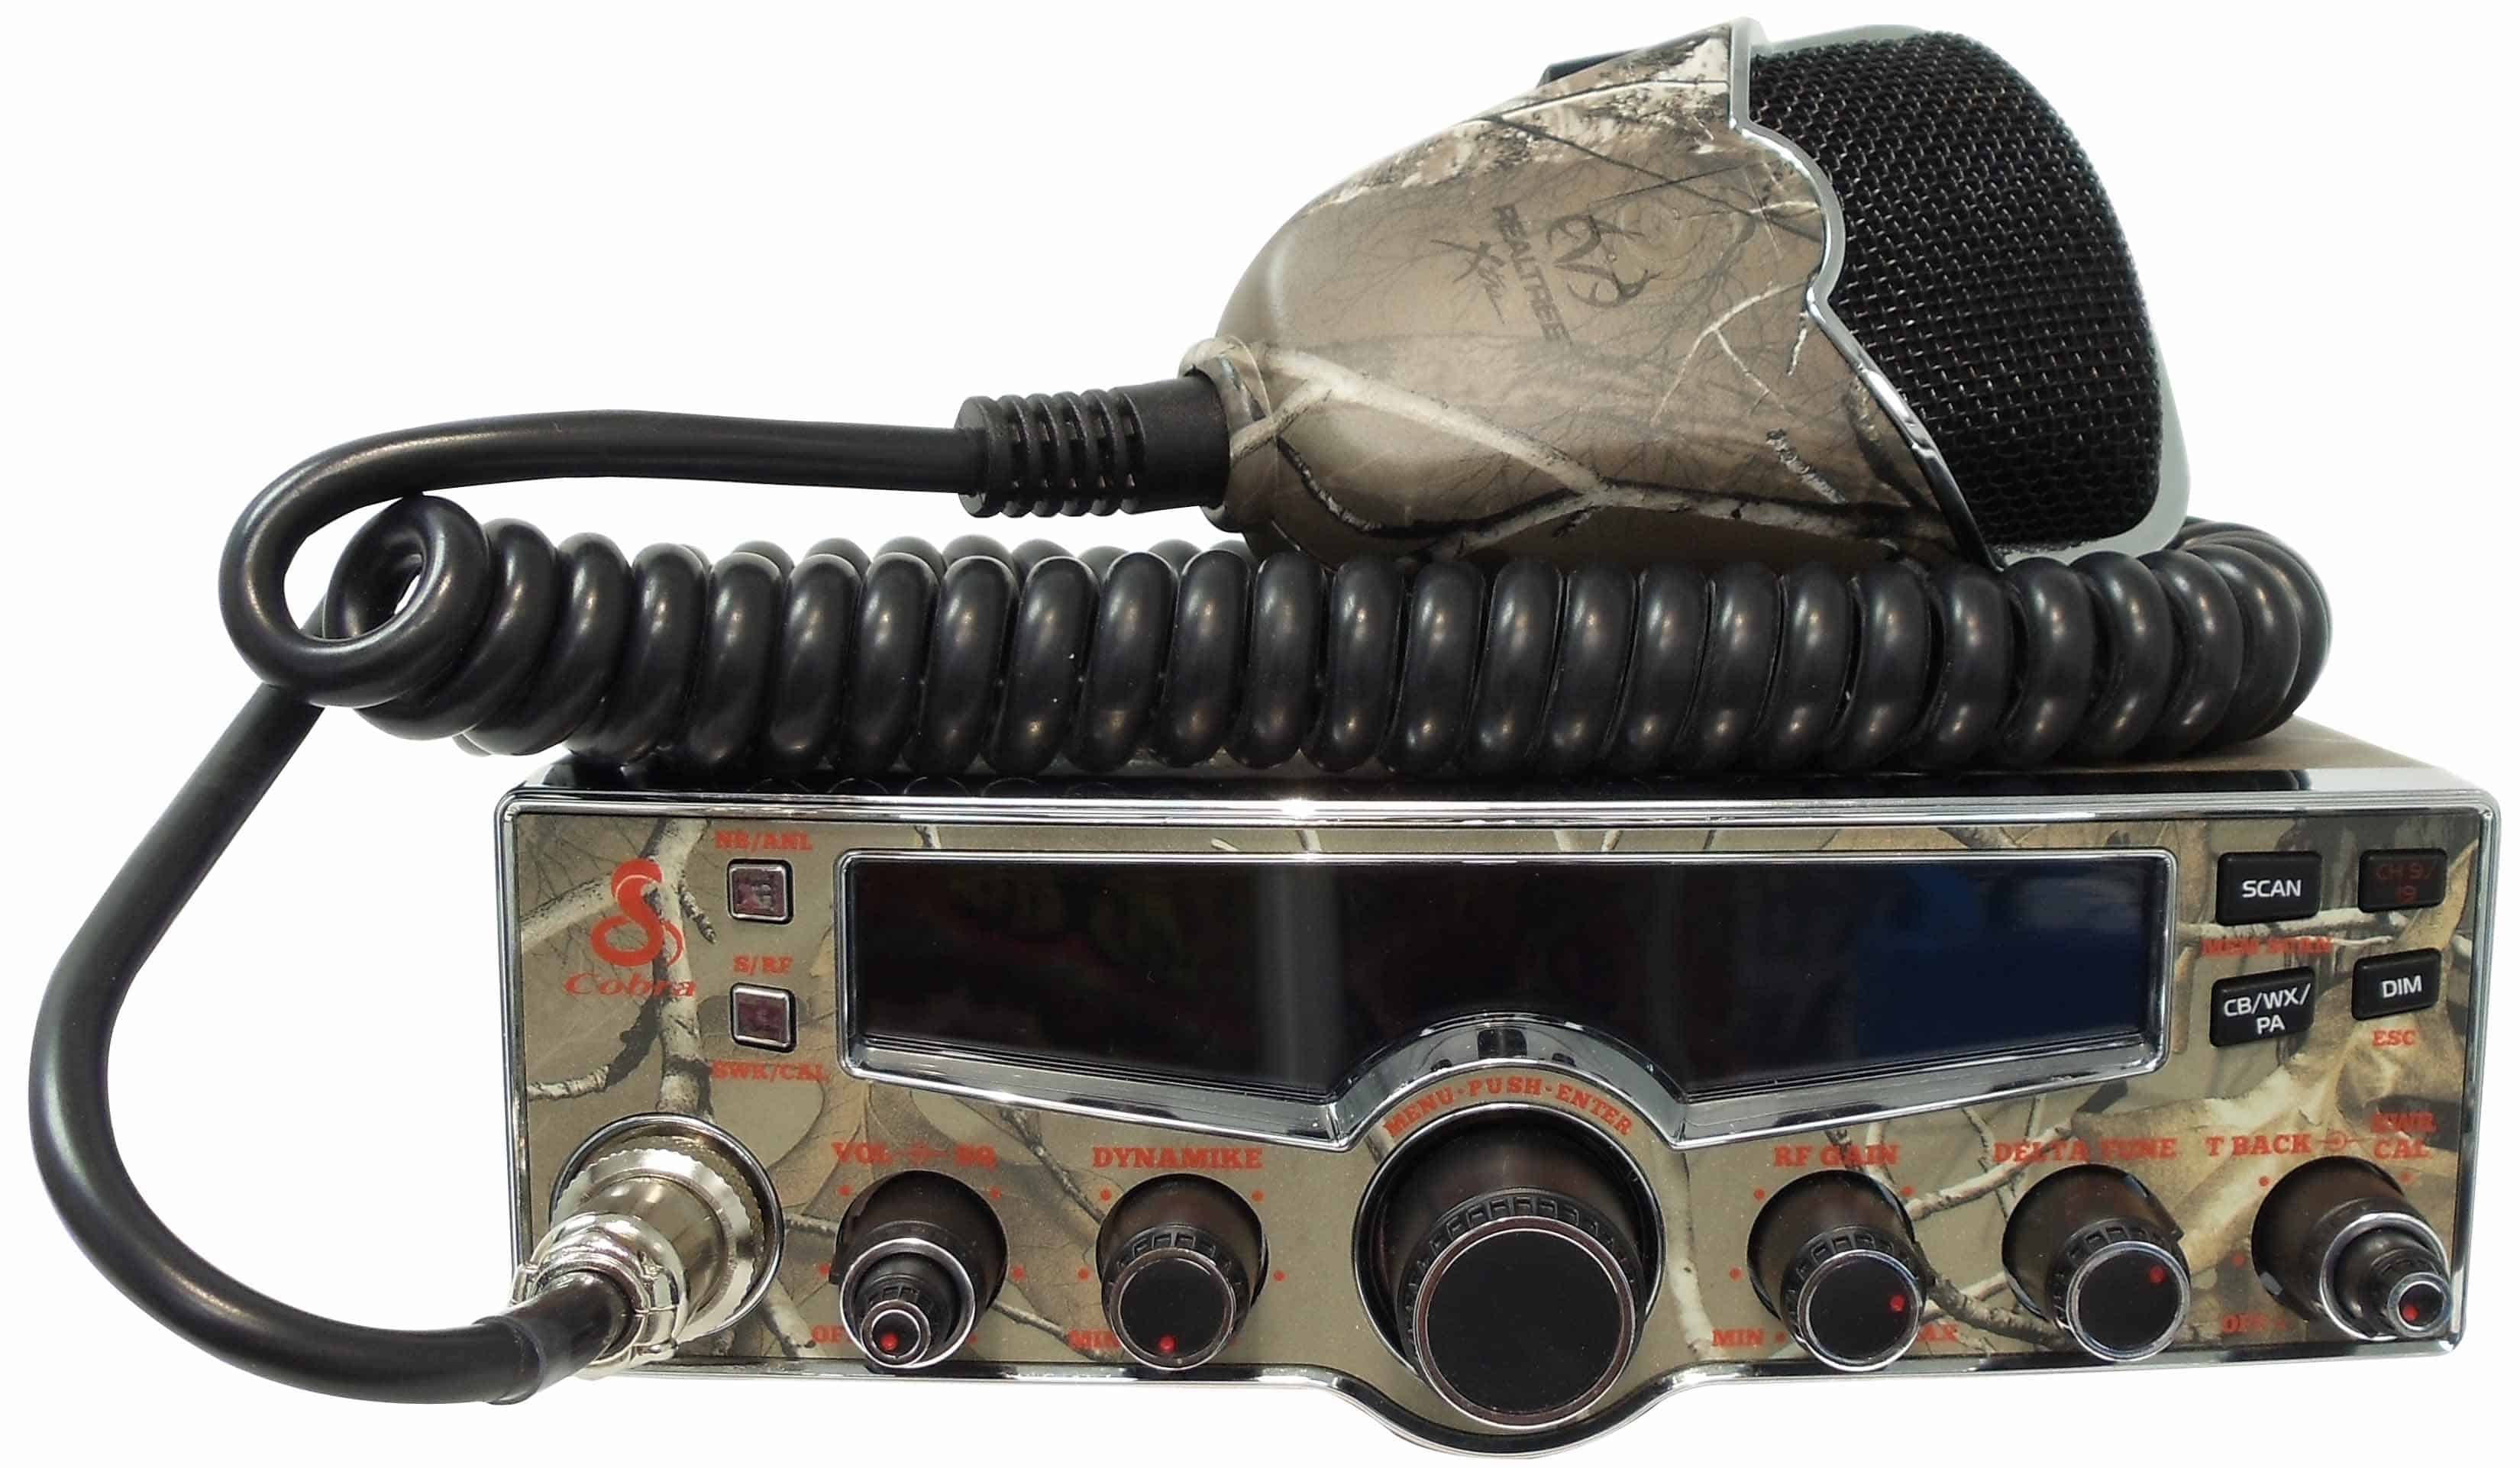 C29LXCAMO-T - Cobra® Camo Design CB Radio (Peaked and Tuned)